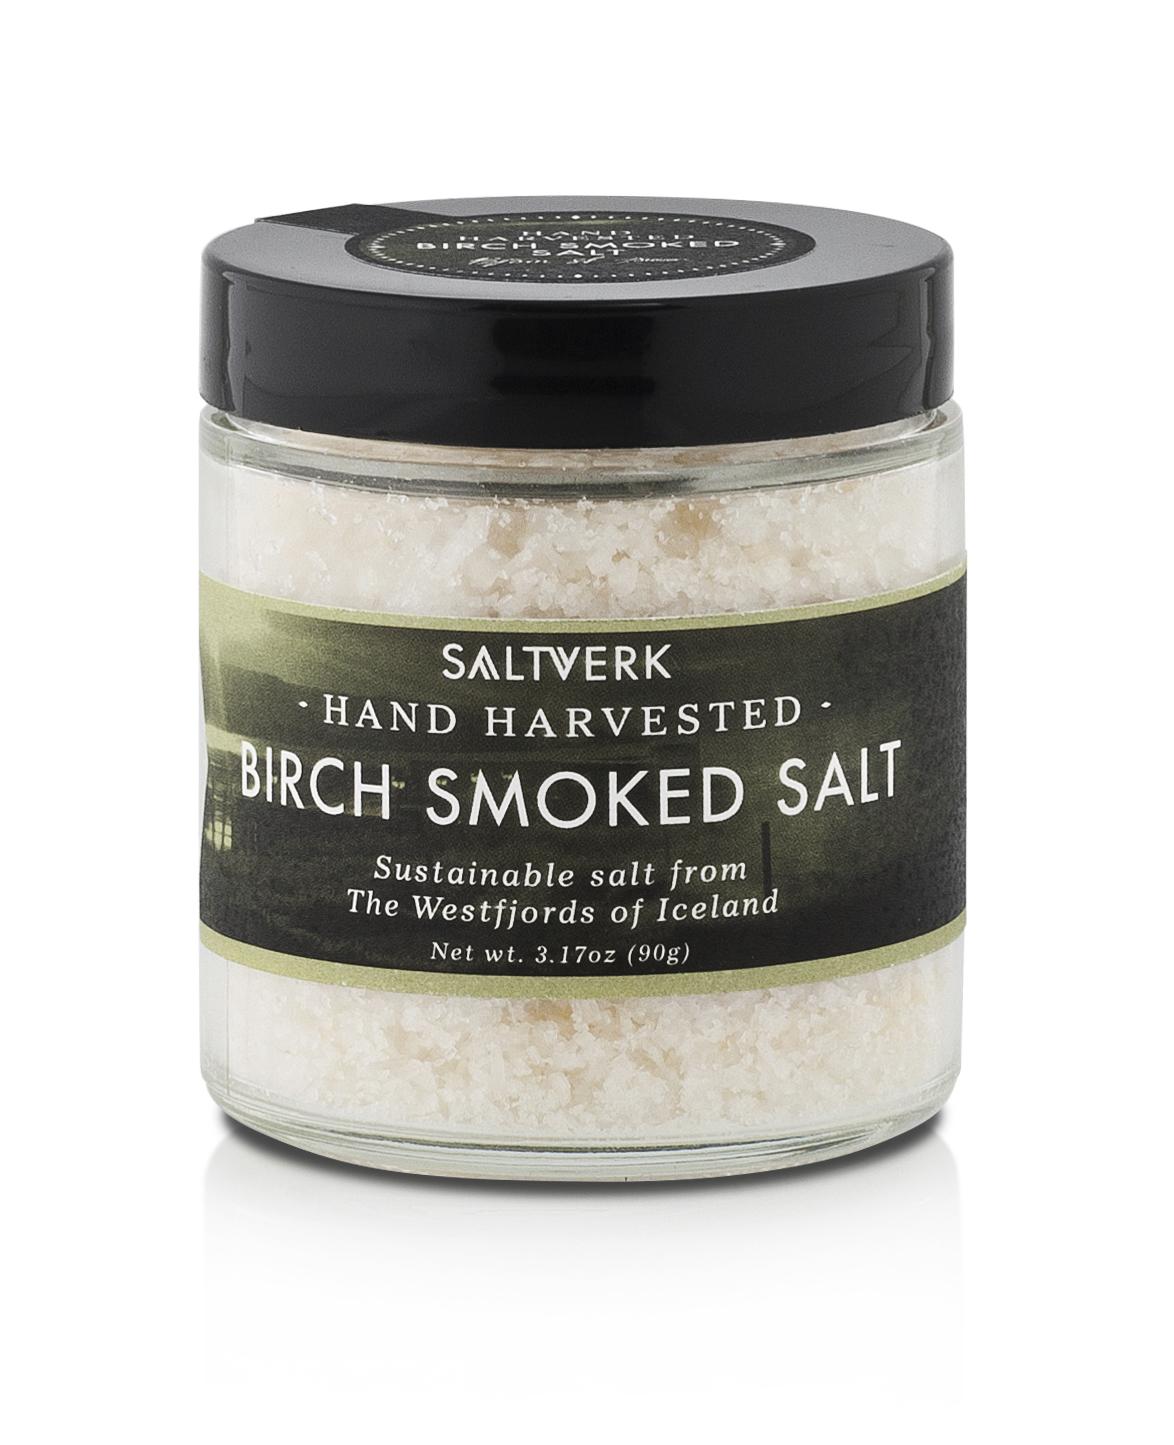 Birch smoked salt - $12.99